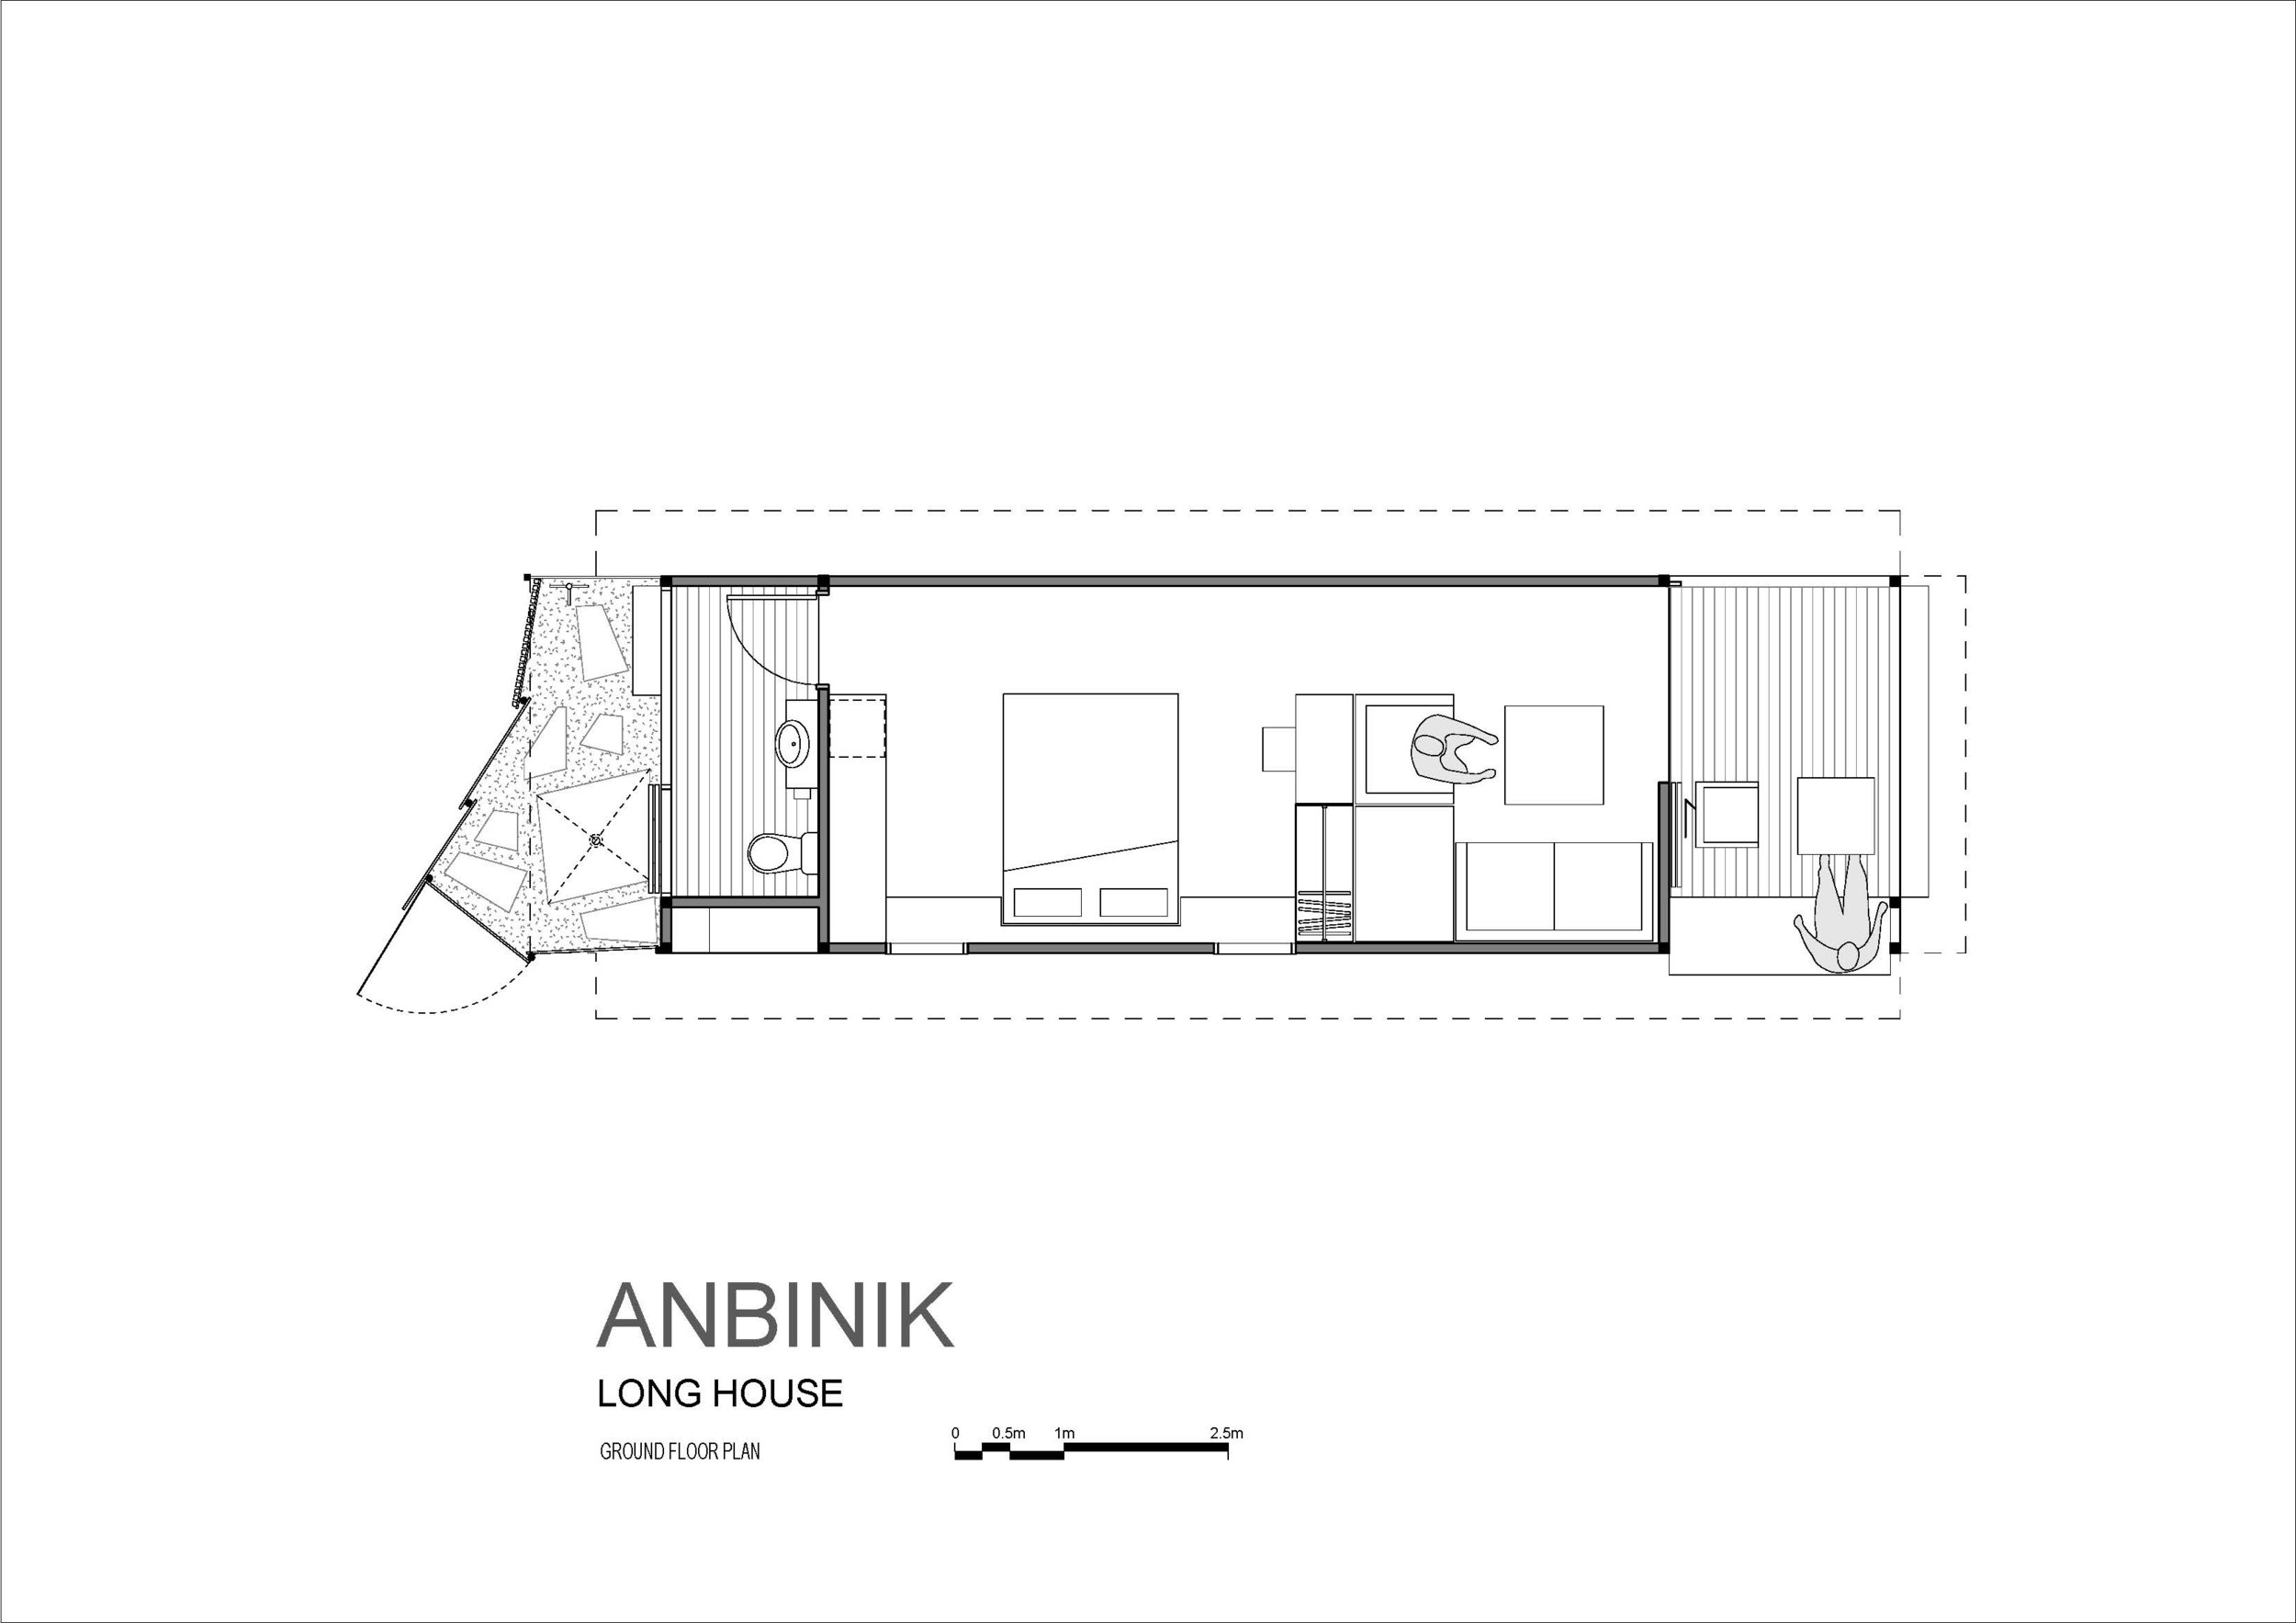 ANBINIK BUNGALOW_Longhouse.jpg